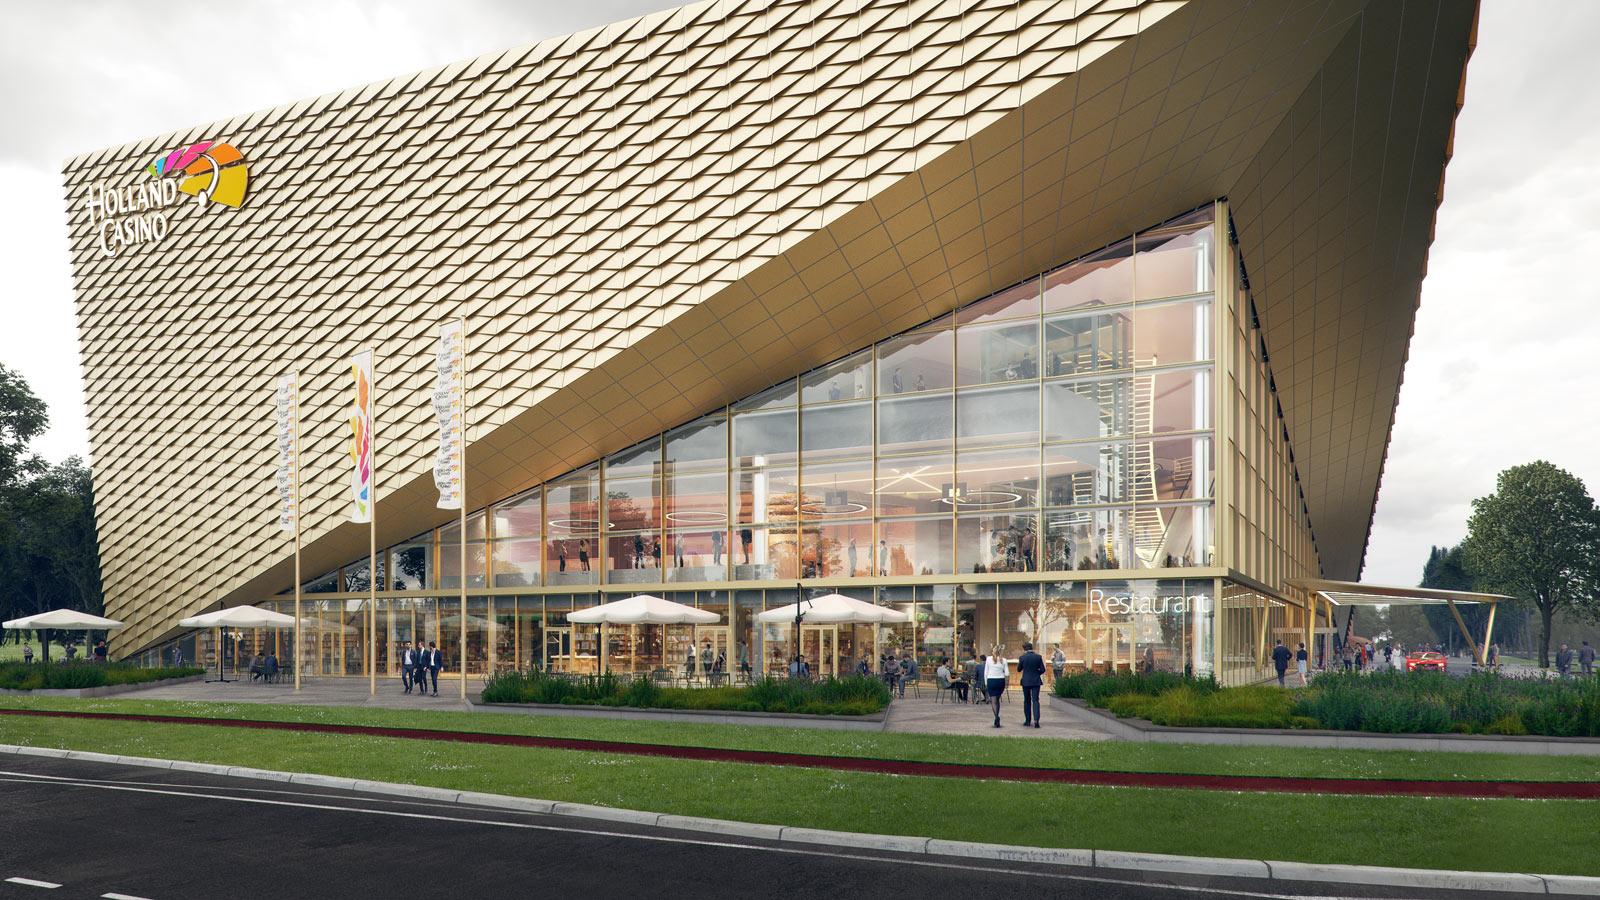 Holland Casino Utrecht Adres